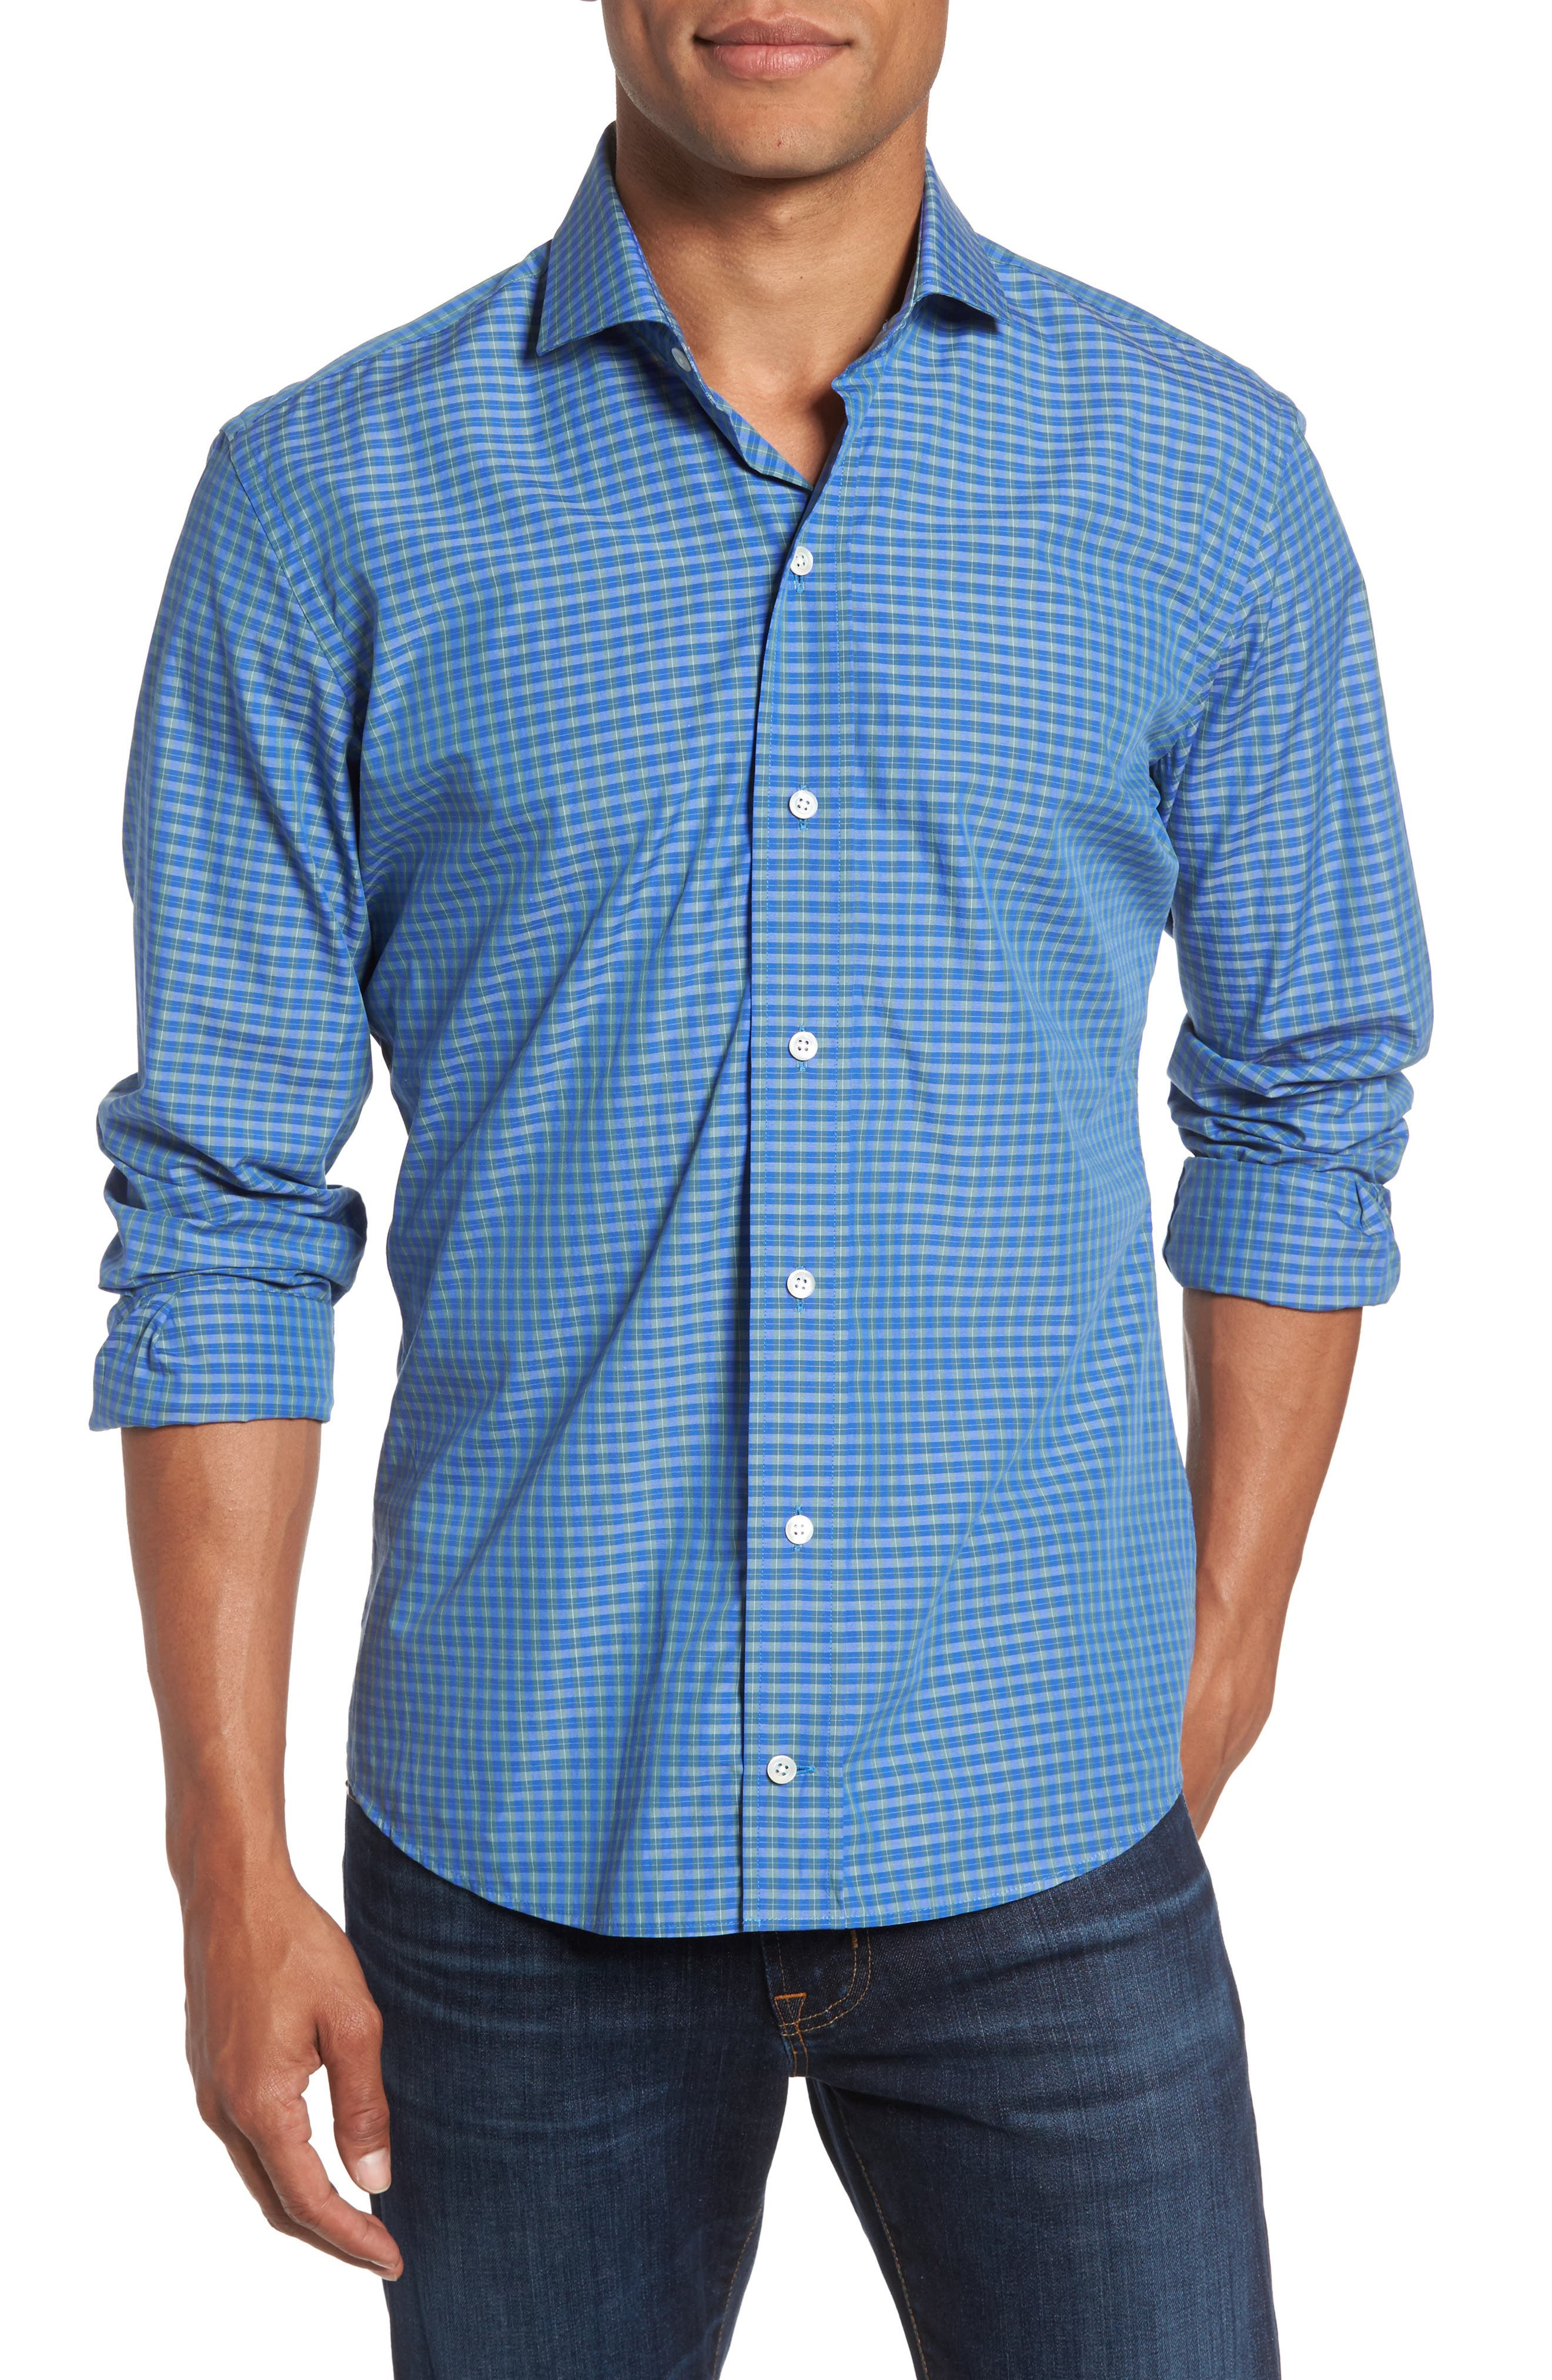 Alternate Image 1 Selected - Ledbury Alden Slim Fit Plaid Sport Shirt